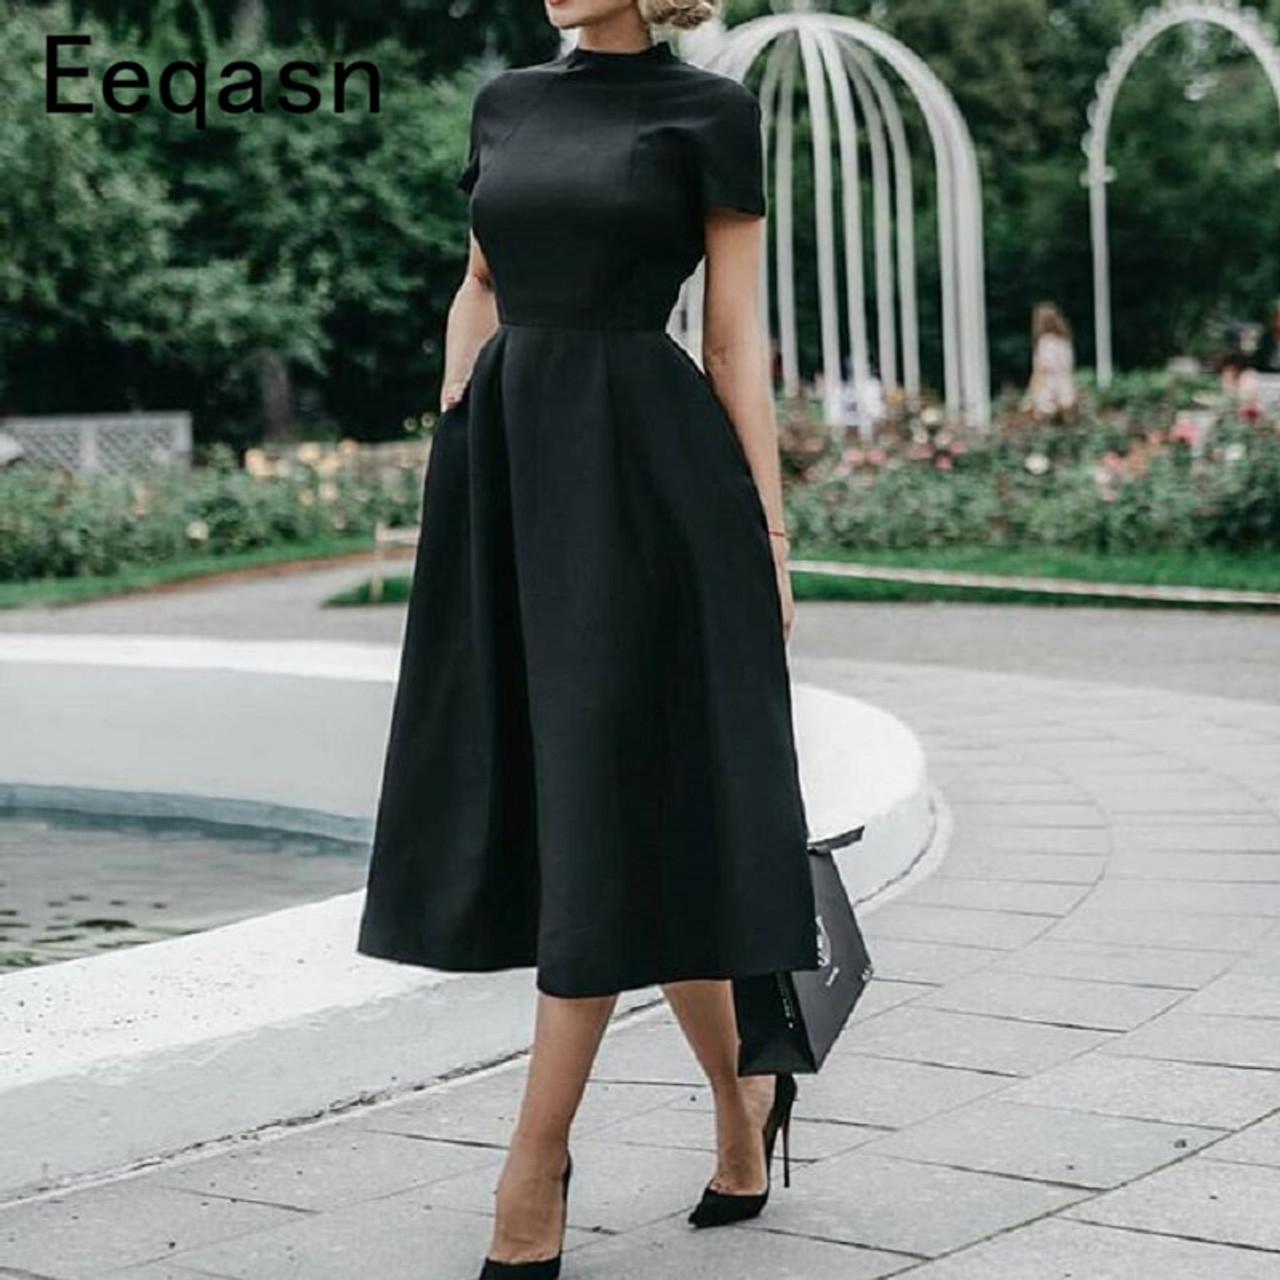 Elegant Black Cocktail Dress for a Party